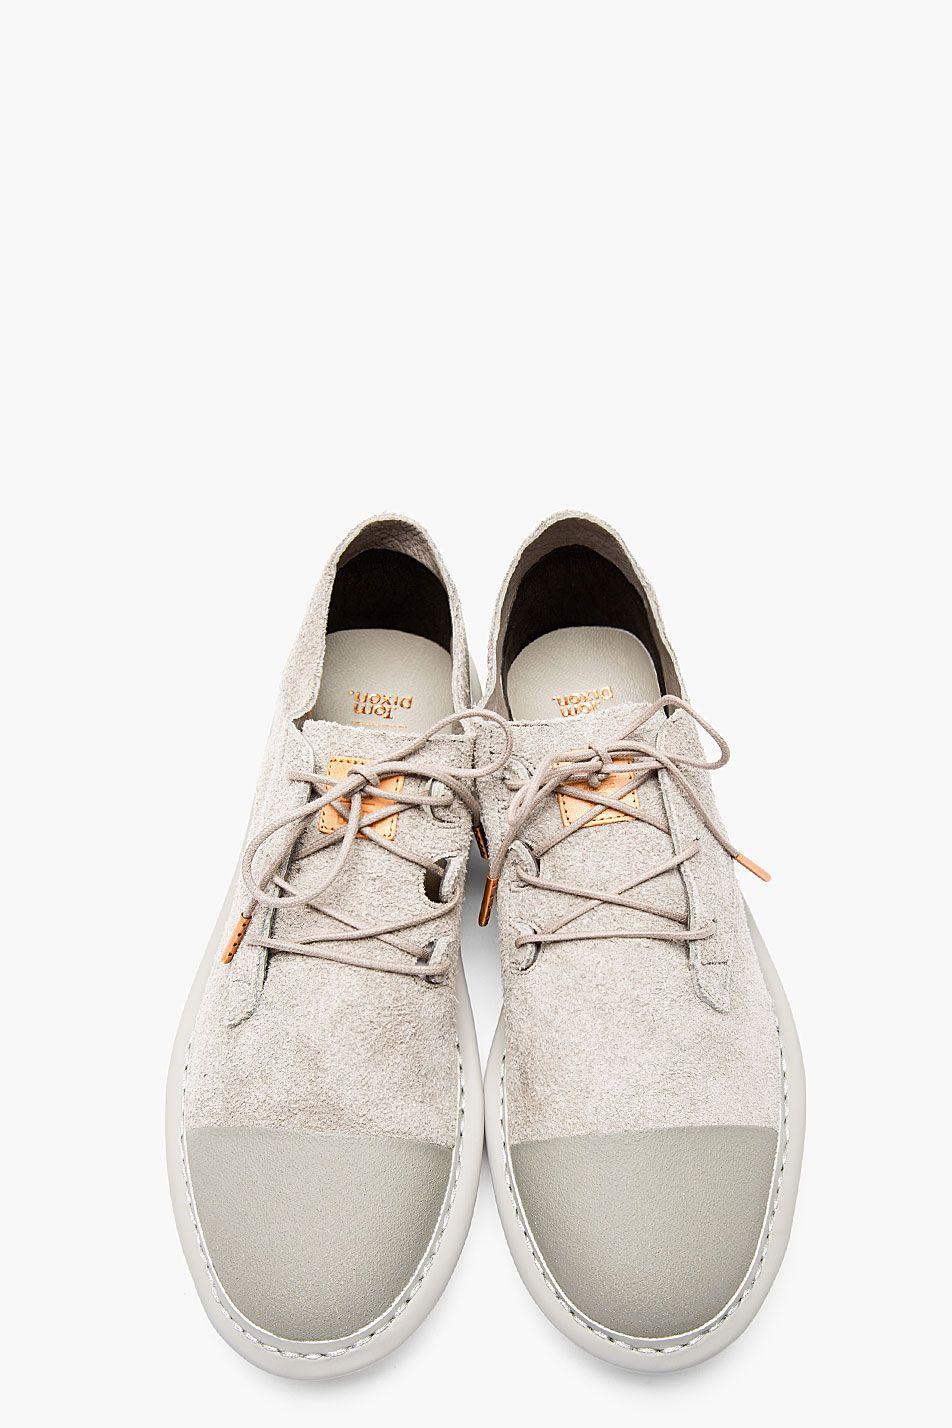 wholesale dealer 14fb2 26dcd ADIDAS BY TOM DIXON Grey suede minimalist traveler s SHOES Seguici su  Hermans Style diventa nostra fan